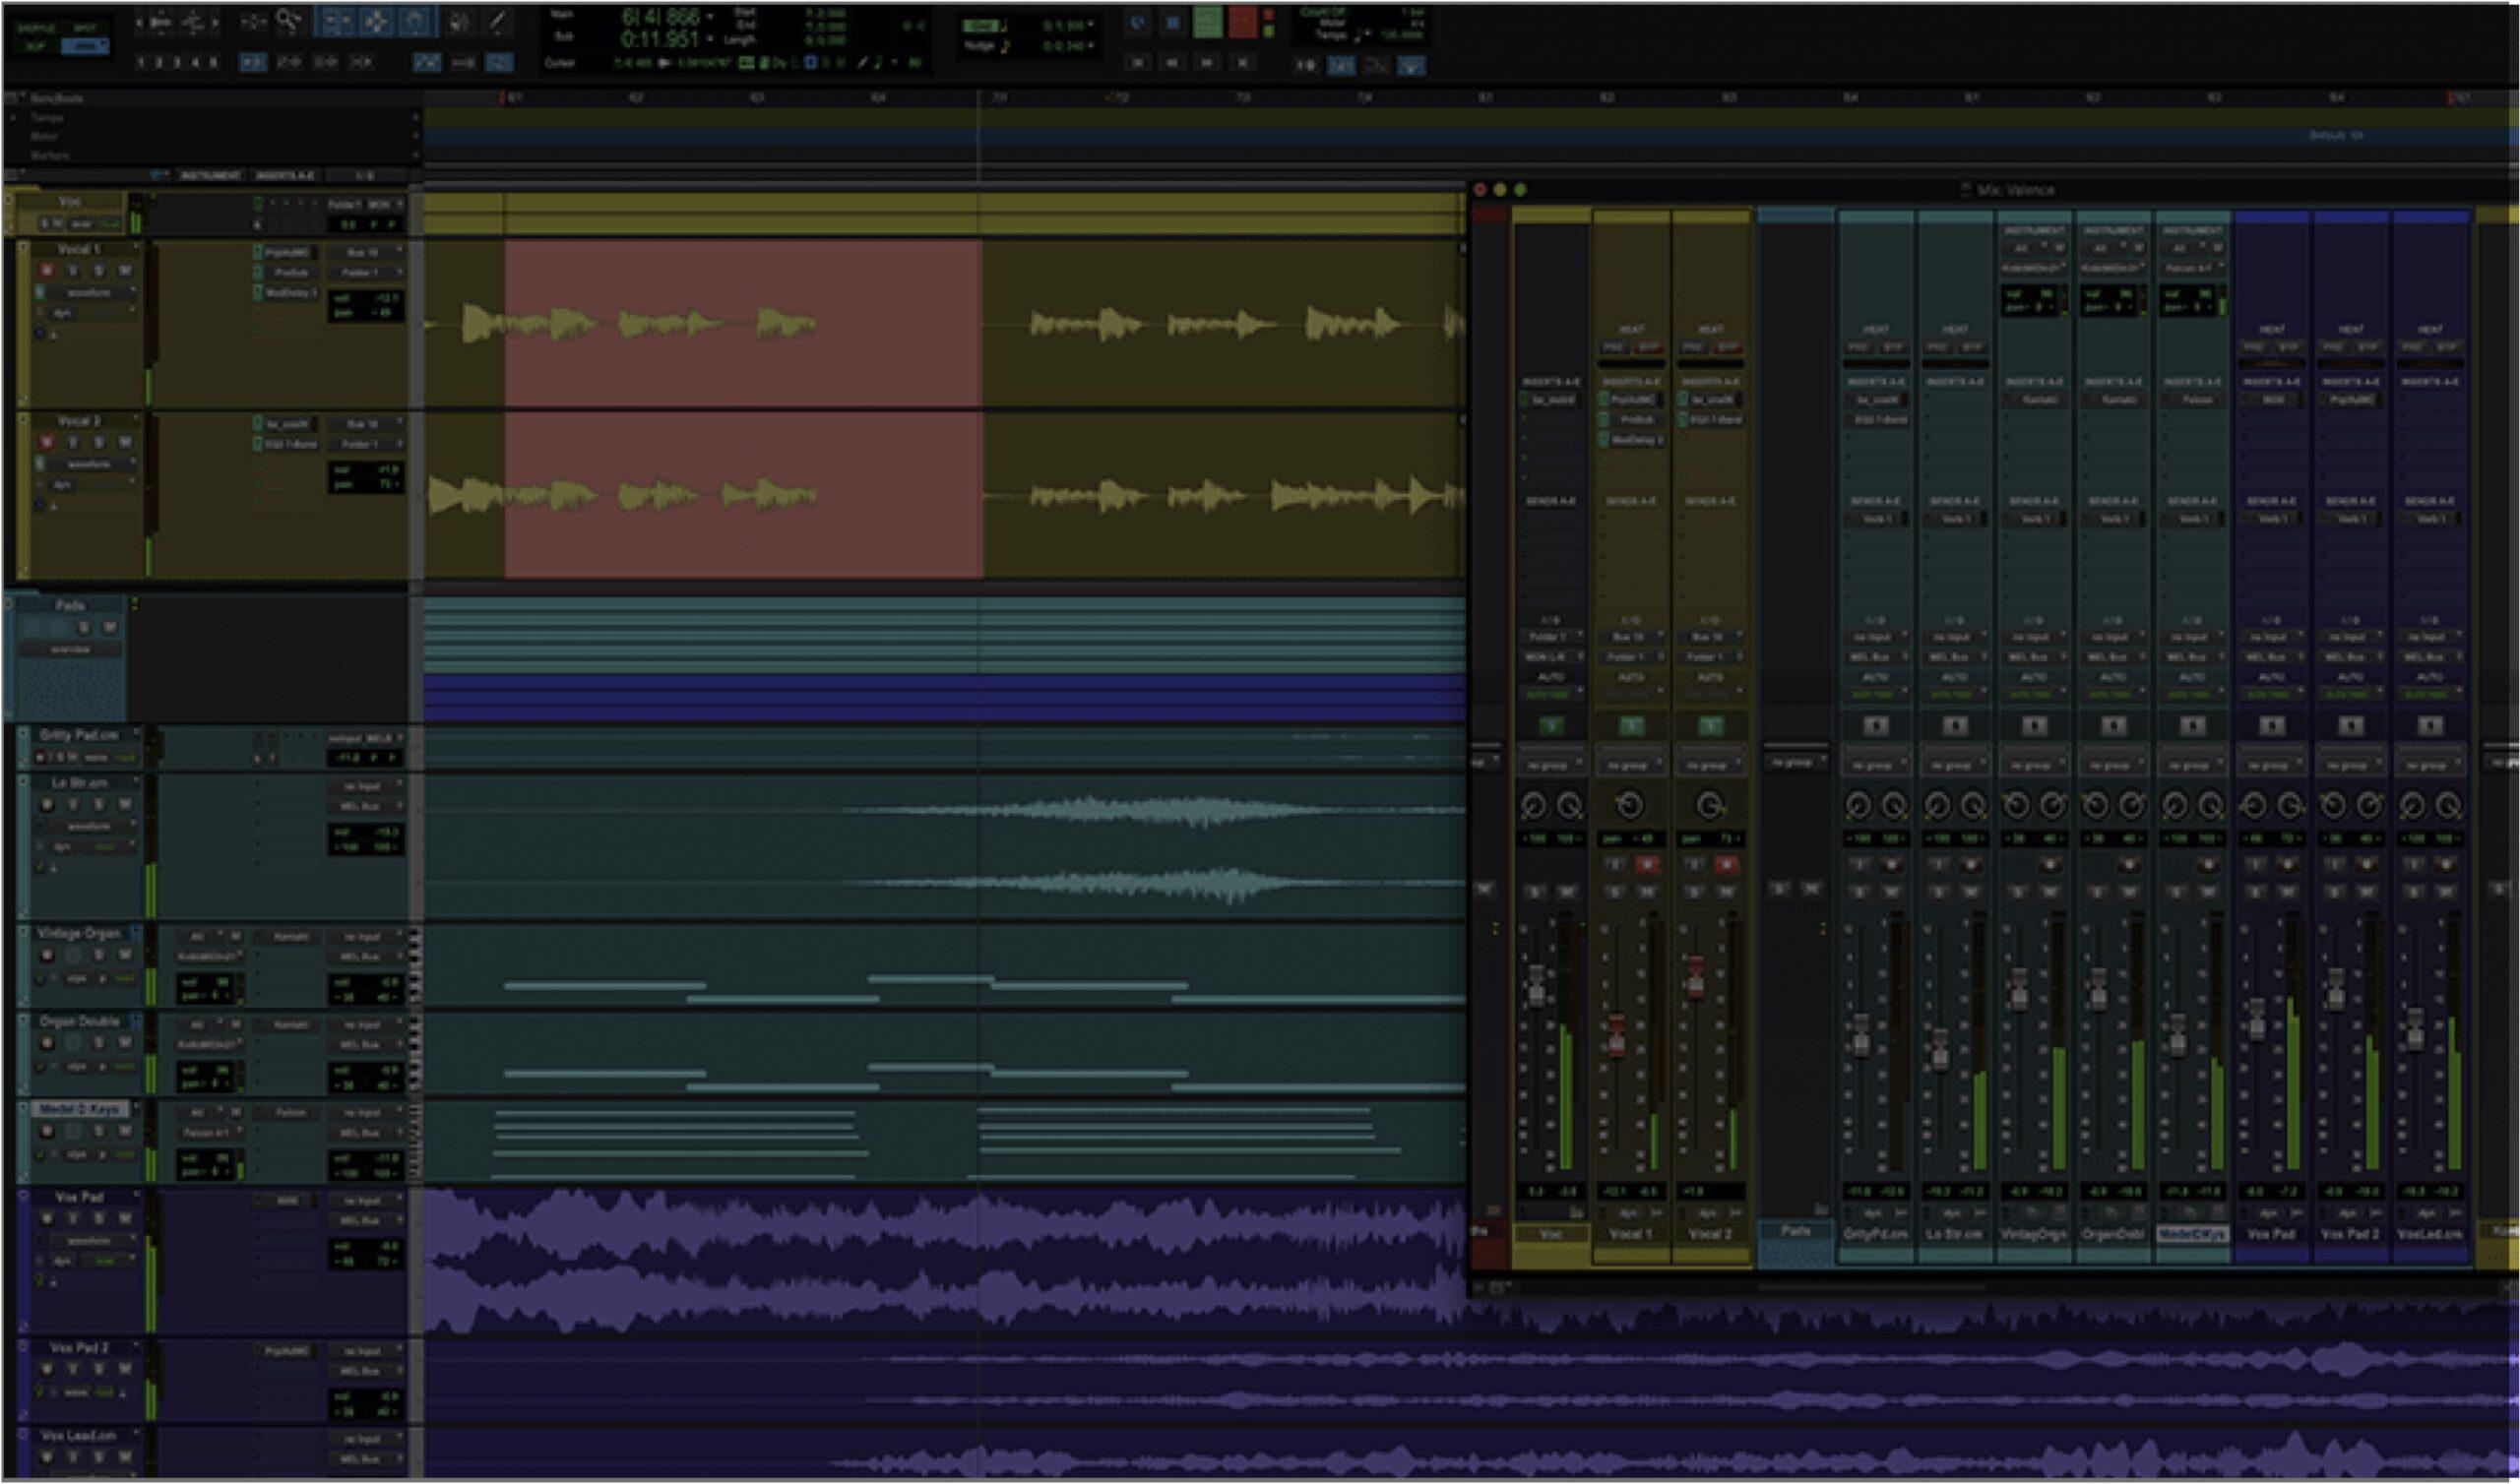 AI作曲と音楽AIプログラミングを学ぶ 日本初、唯一の音楽AI専門スクール CANPLAY